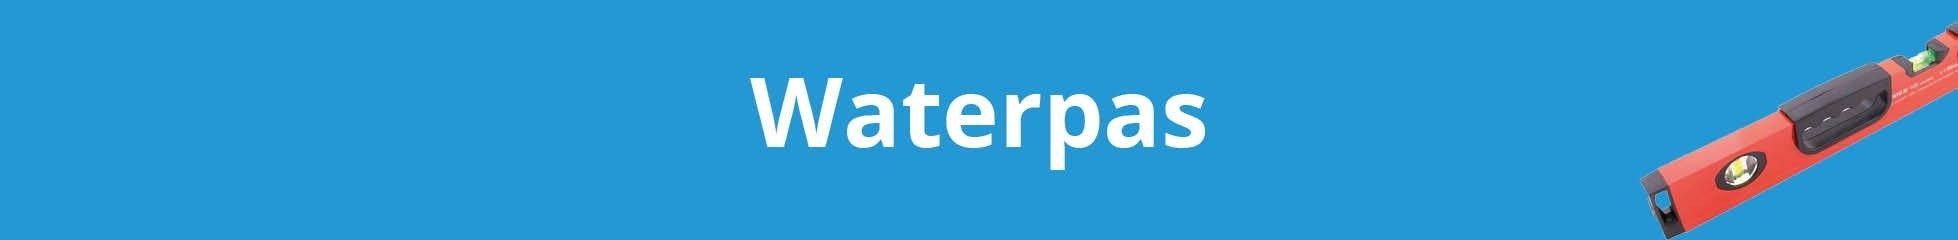 Waterpas